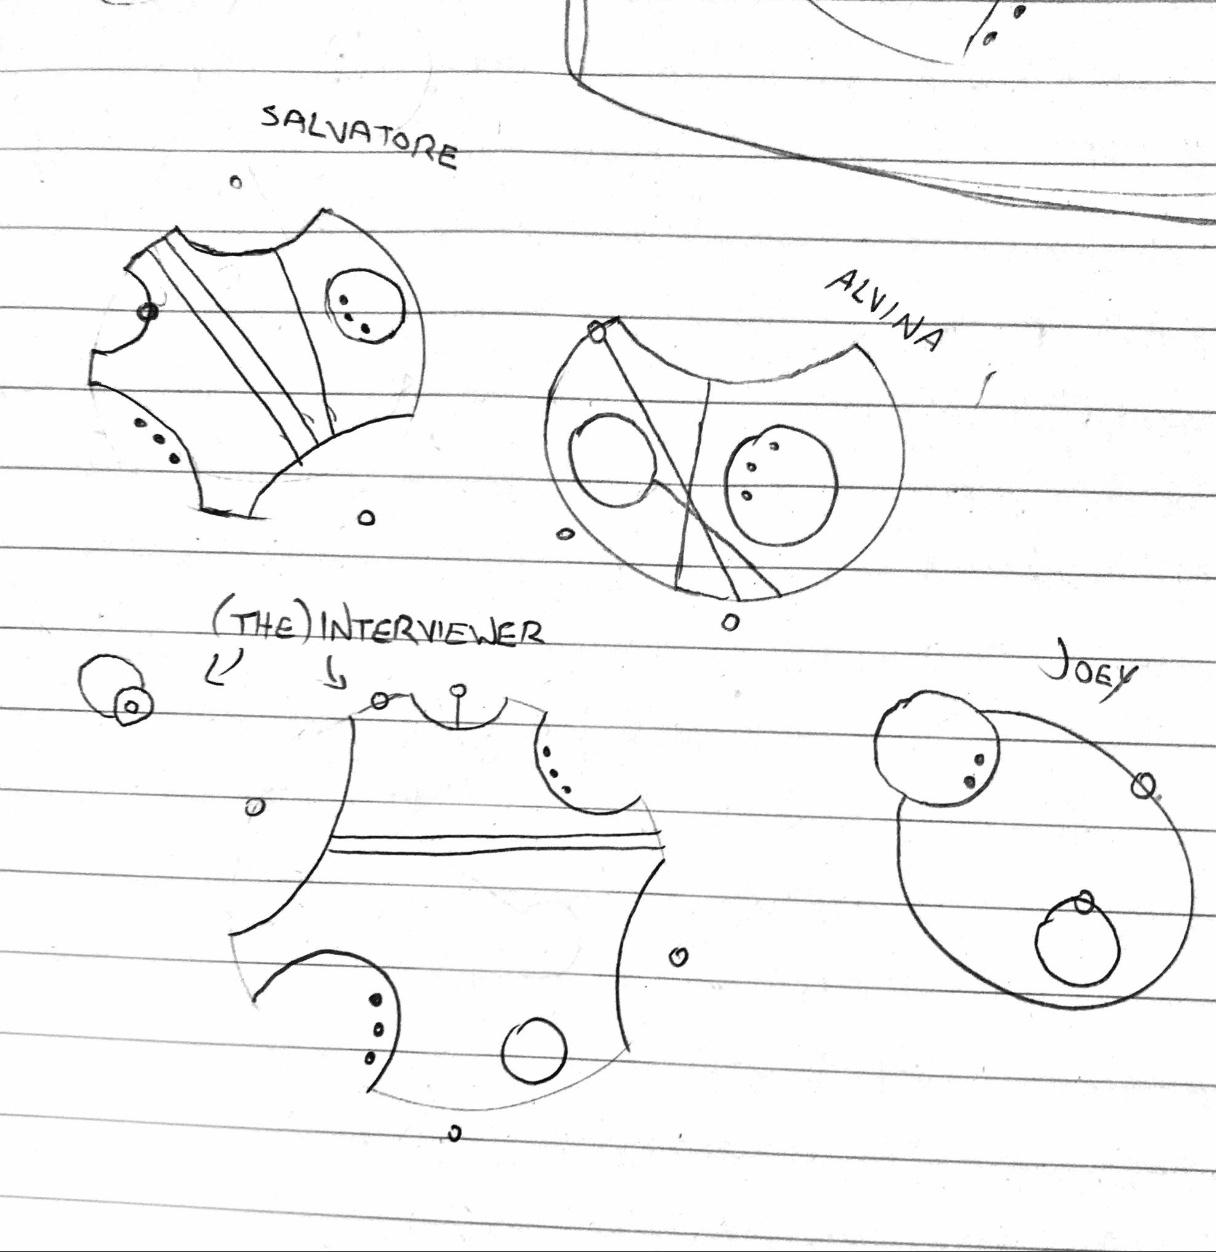 Amelia character names in Gallifreyan by @Silentengee